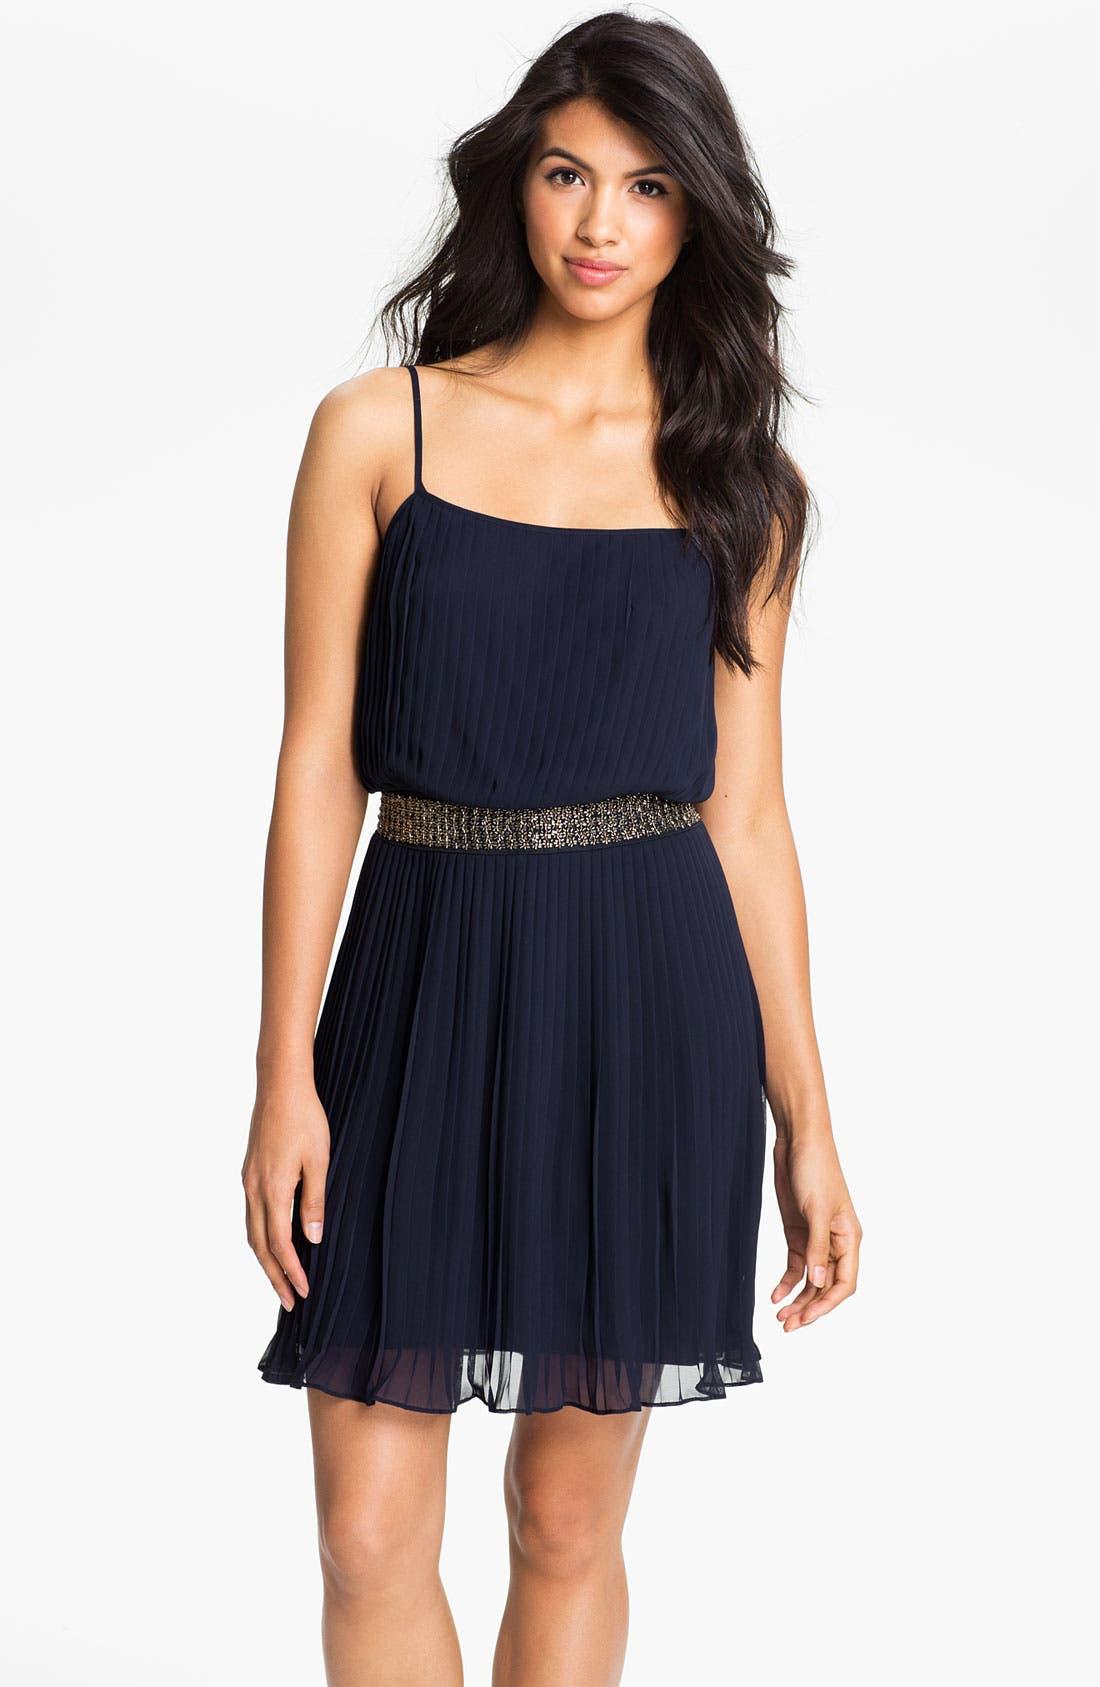 Alternate Image 1 Selected - Adrianna Papell Beaded Waist Pleated Chiffon Dress